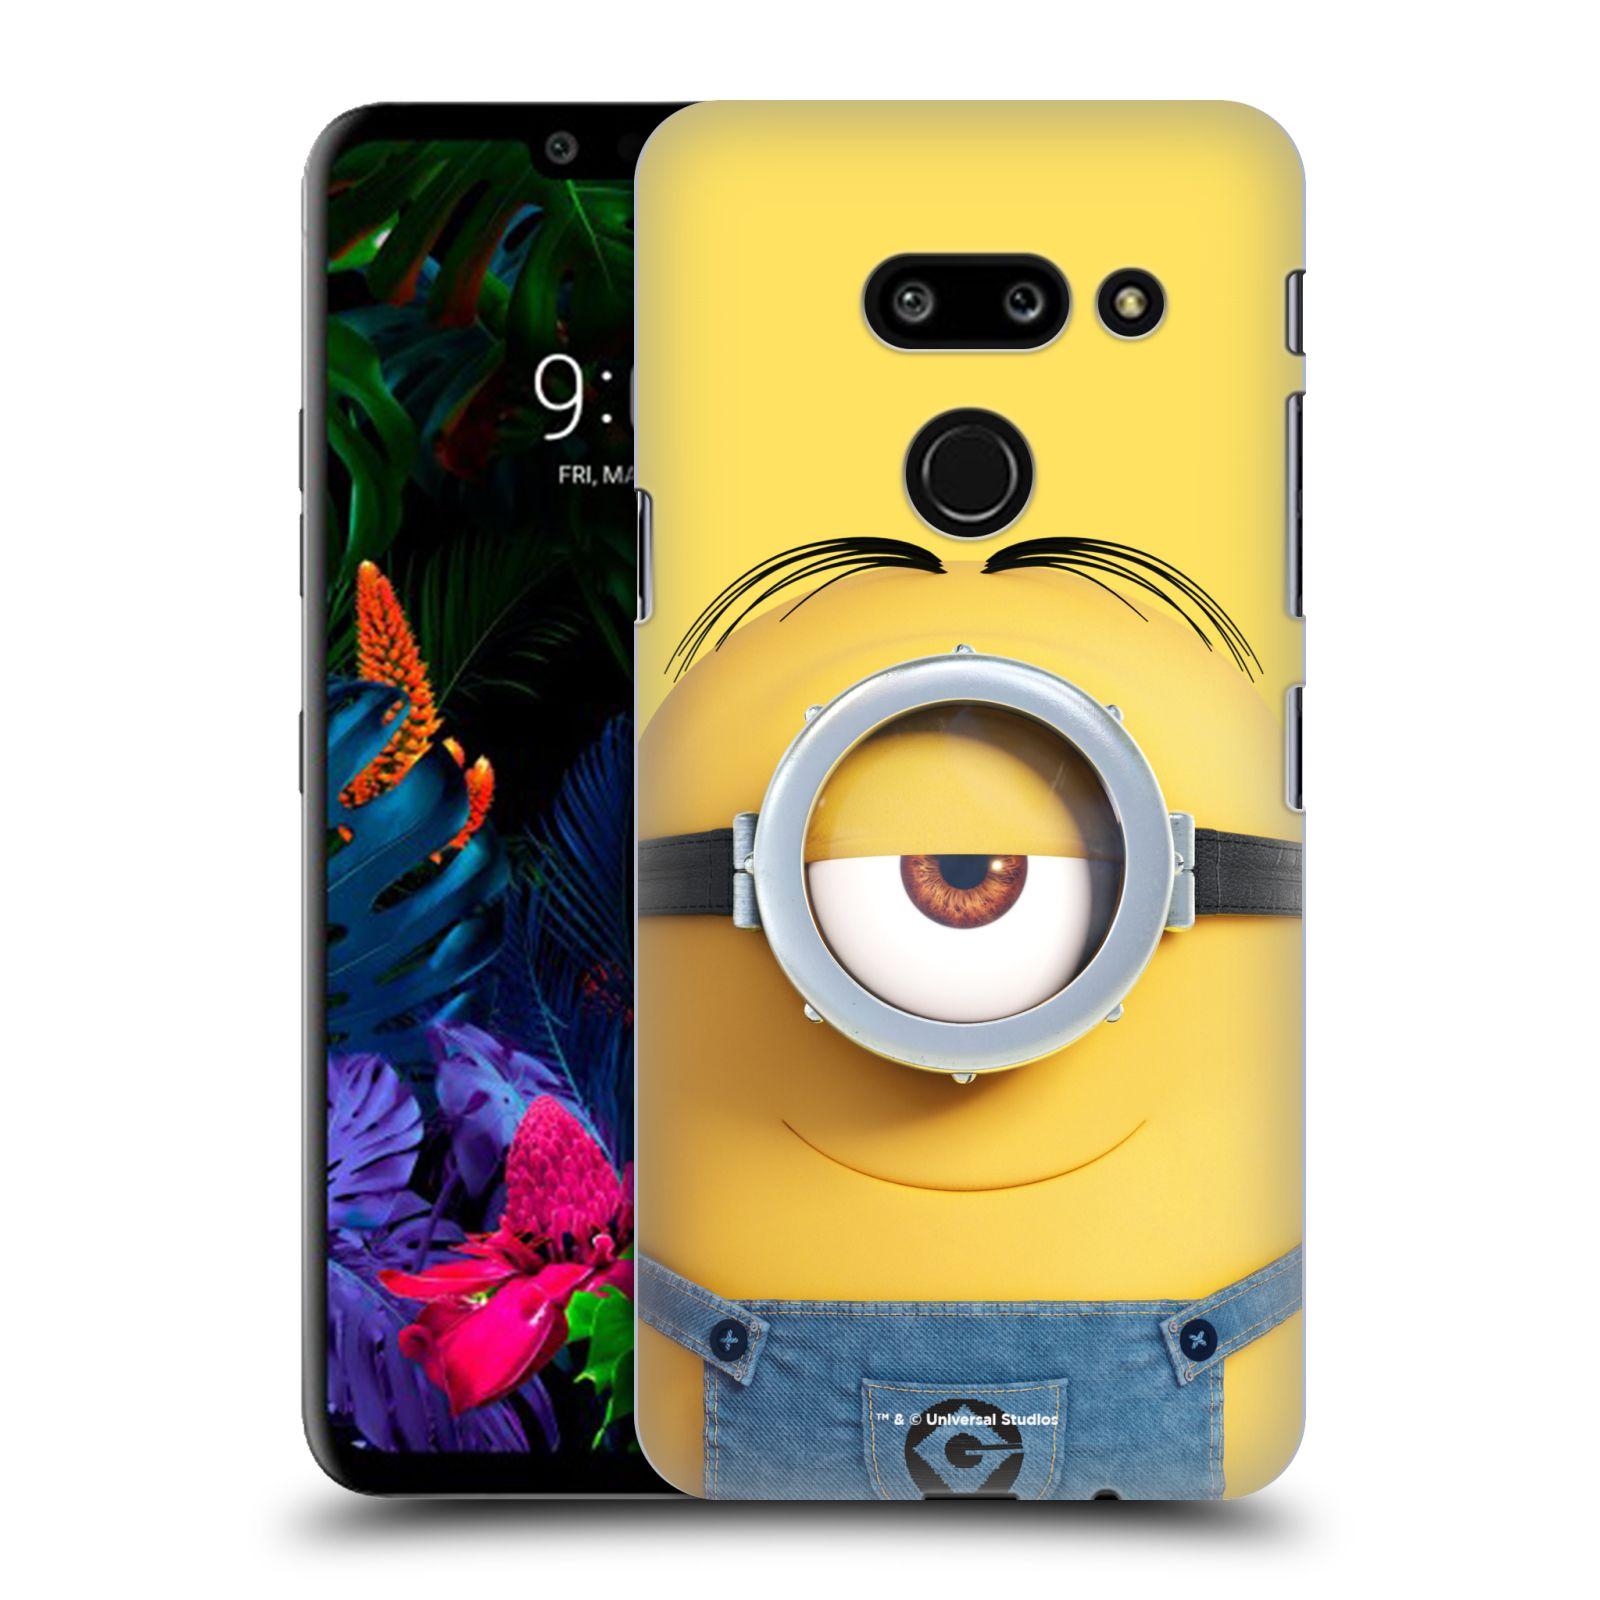 Plastové pouzdro na mobil LG G8 ThinQ - Head Case - Mimoň Stuart z filmu Já, padouch - Despicable Me